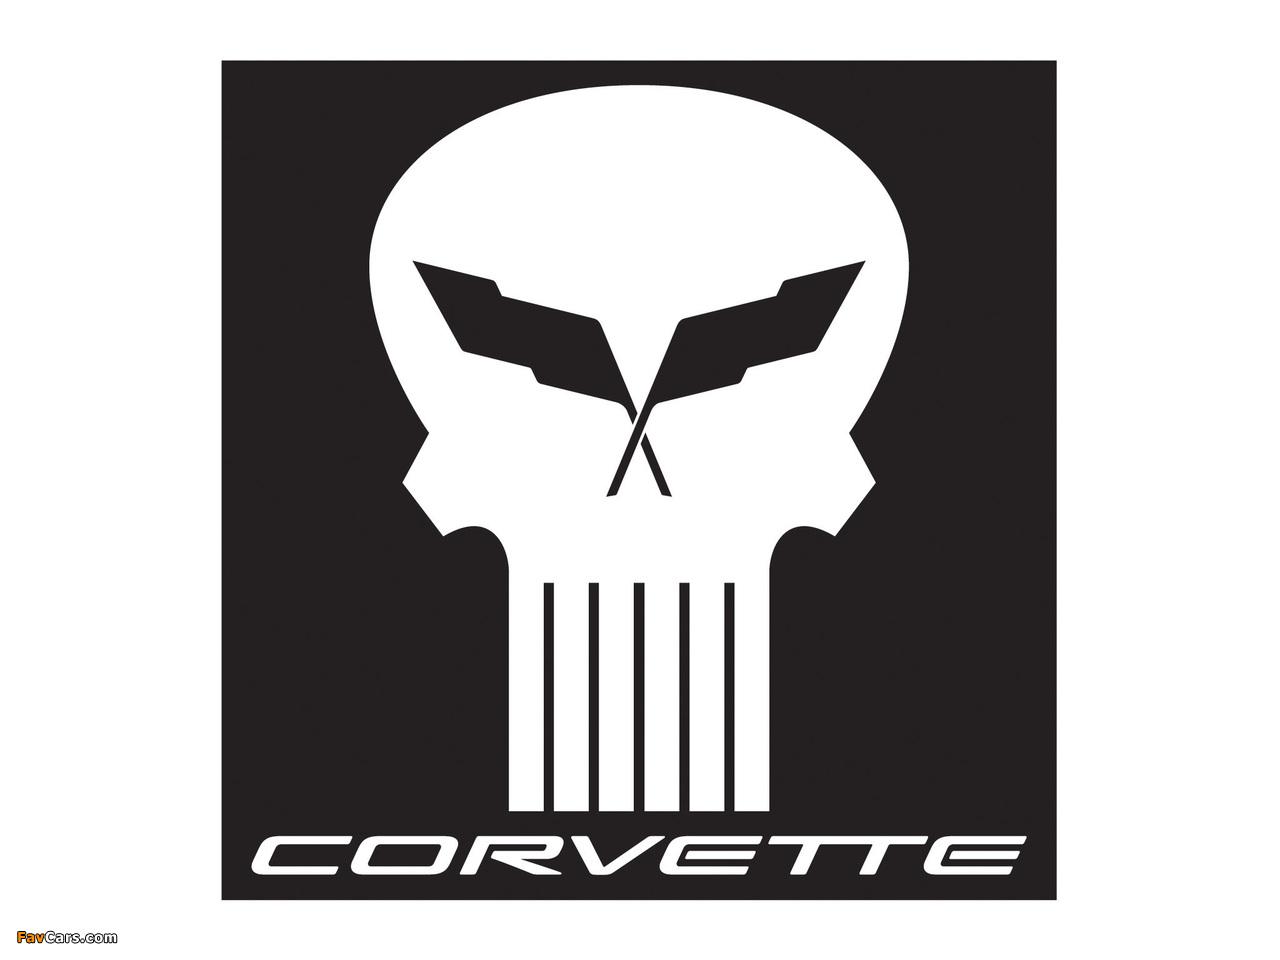 Corvette photos (1280 x 960)